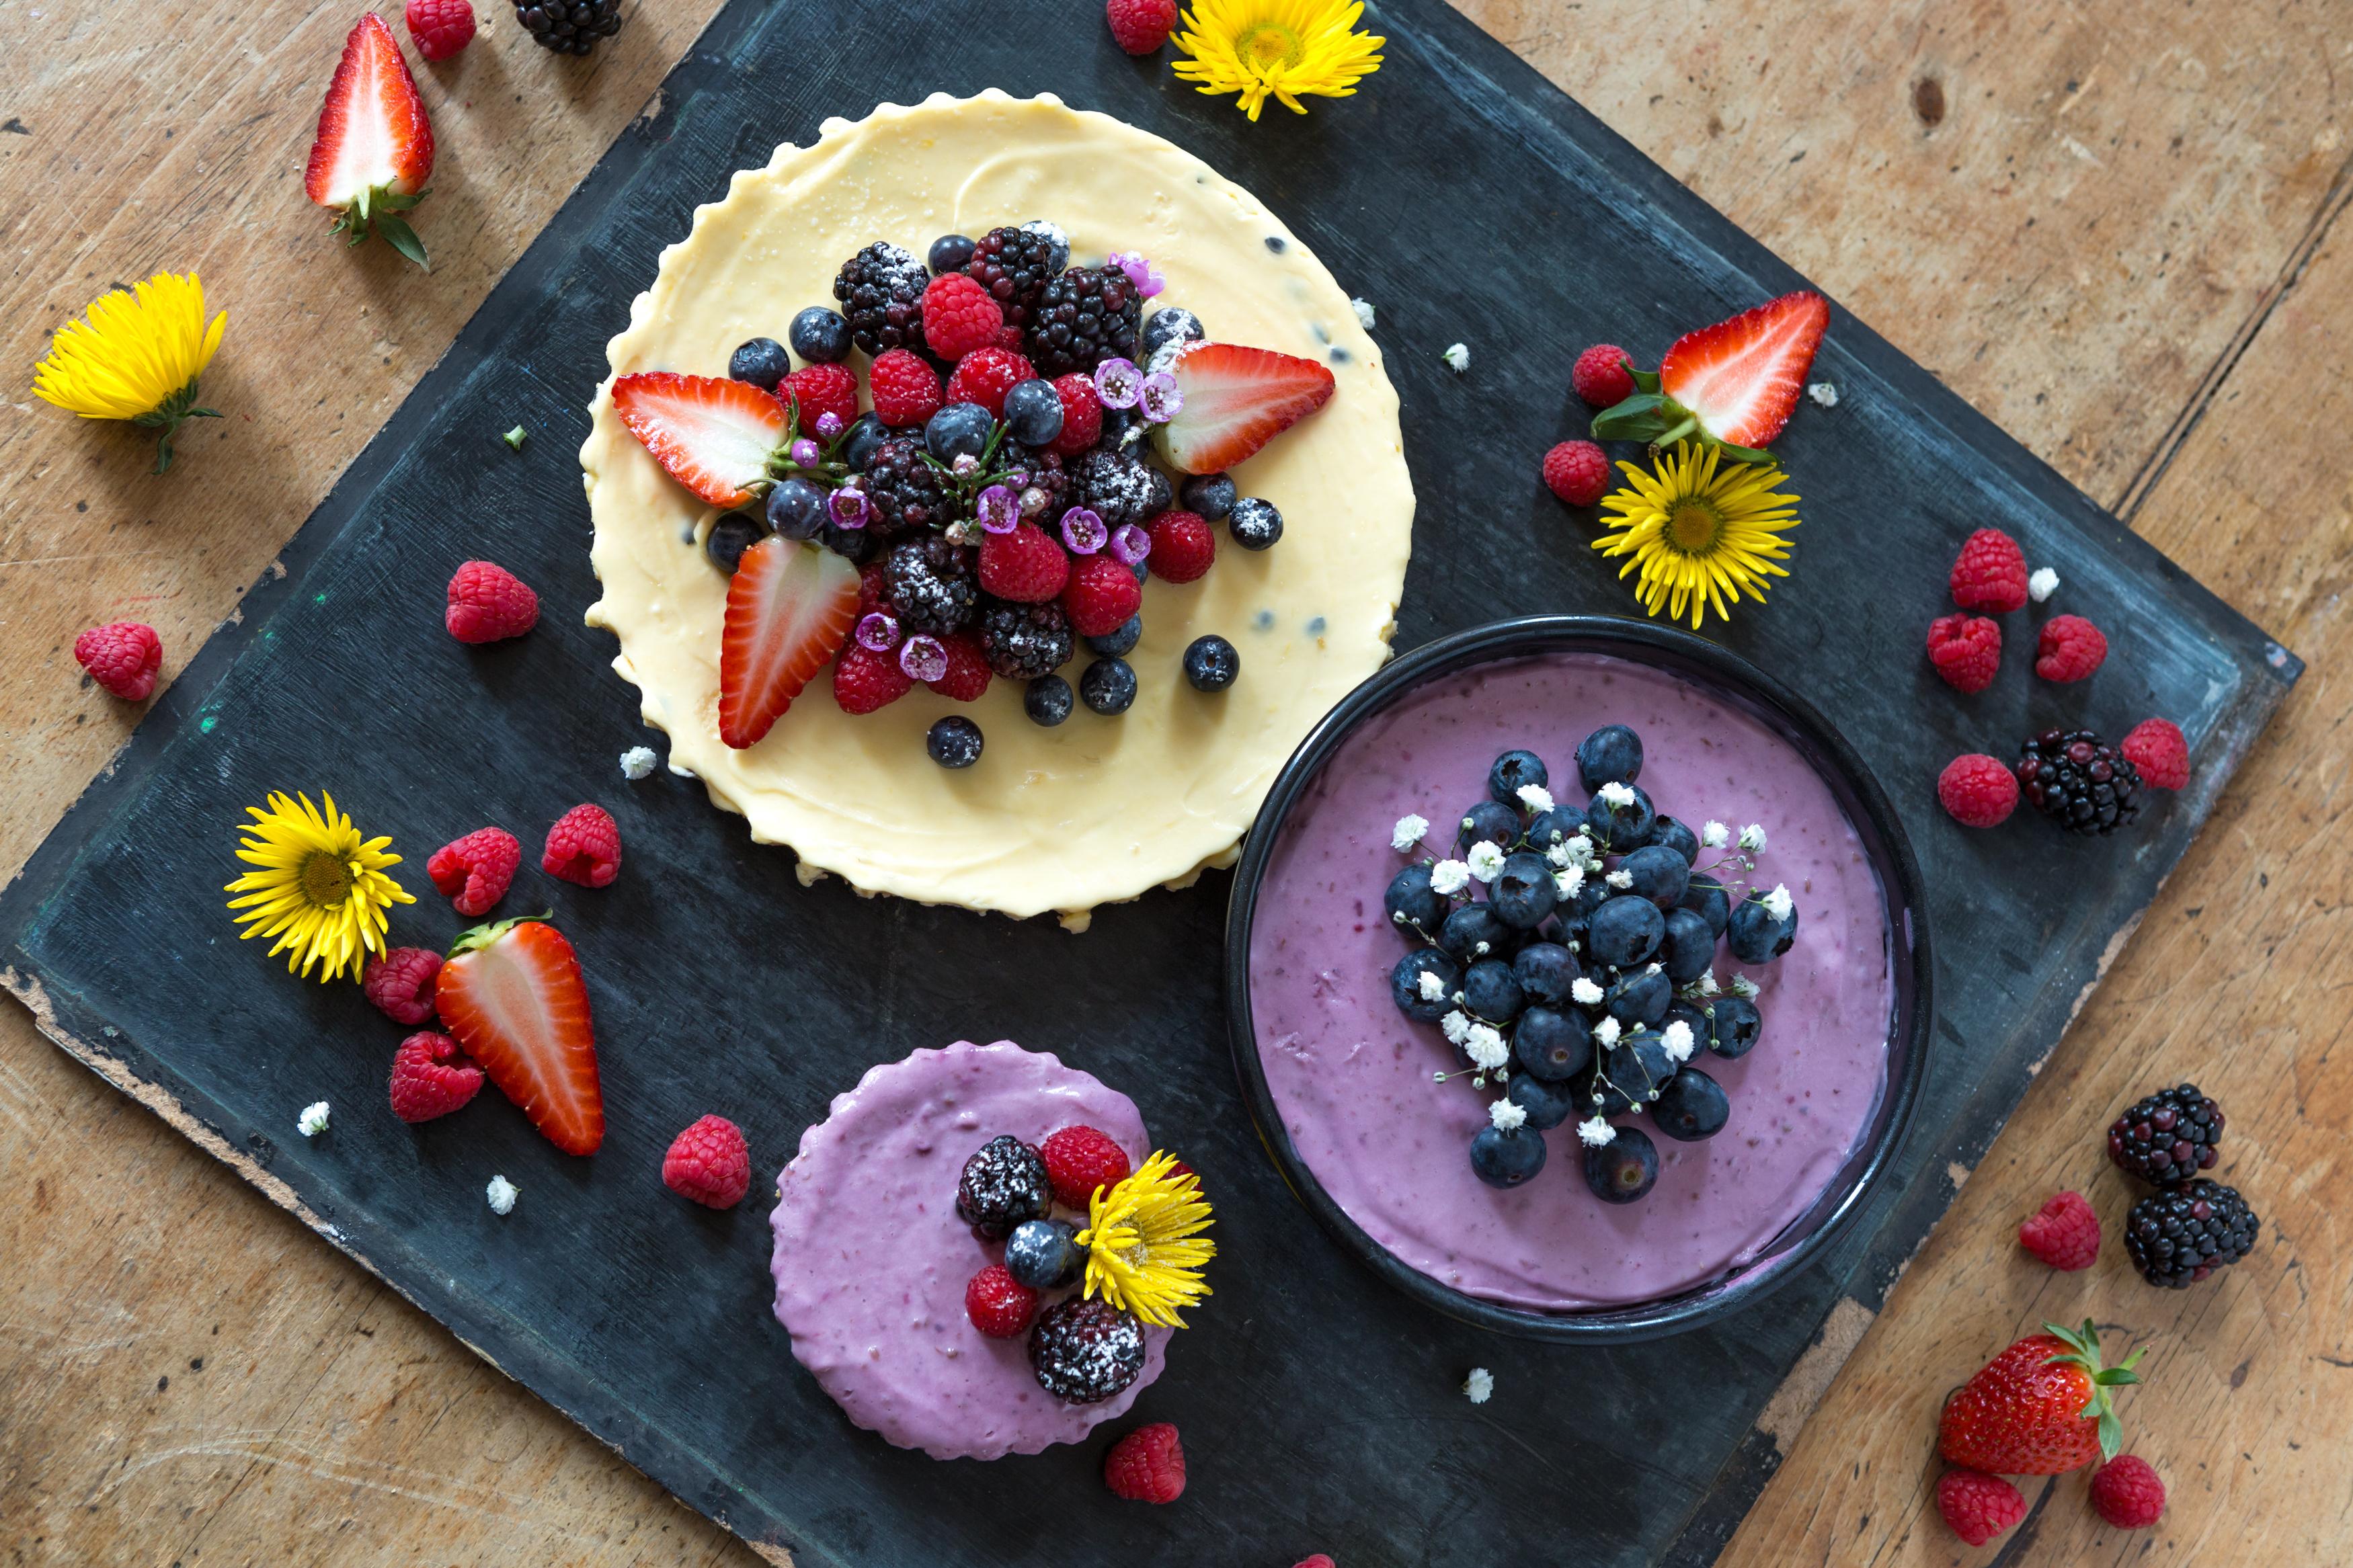 Passion Fruit & Blueberry Cheese Cakes Miss Tortology E17 Artisan Cakes